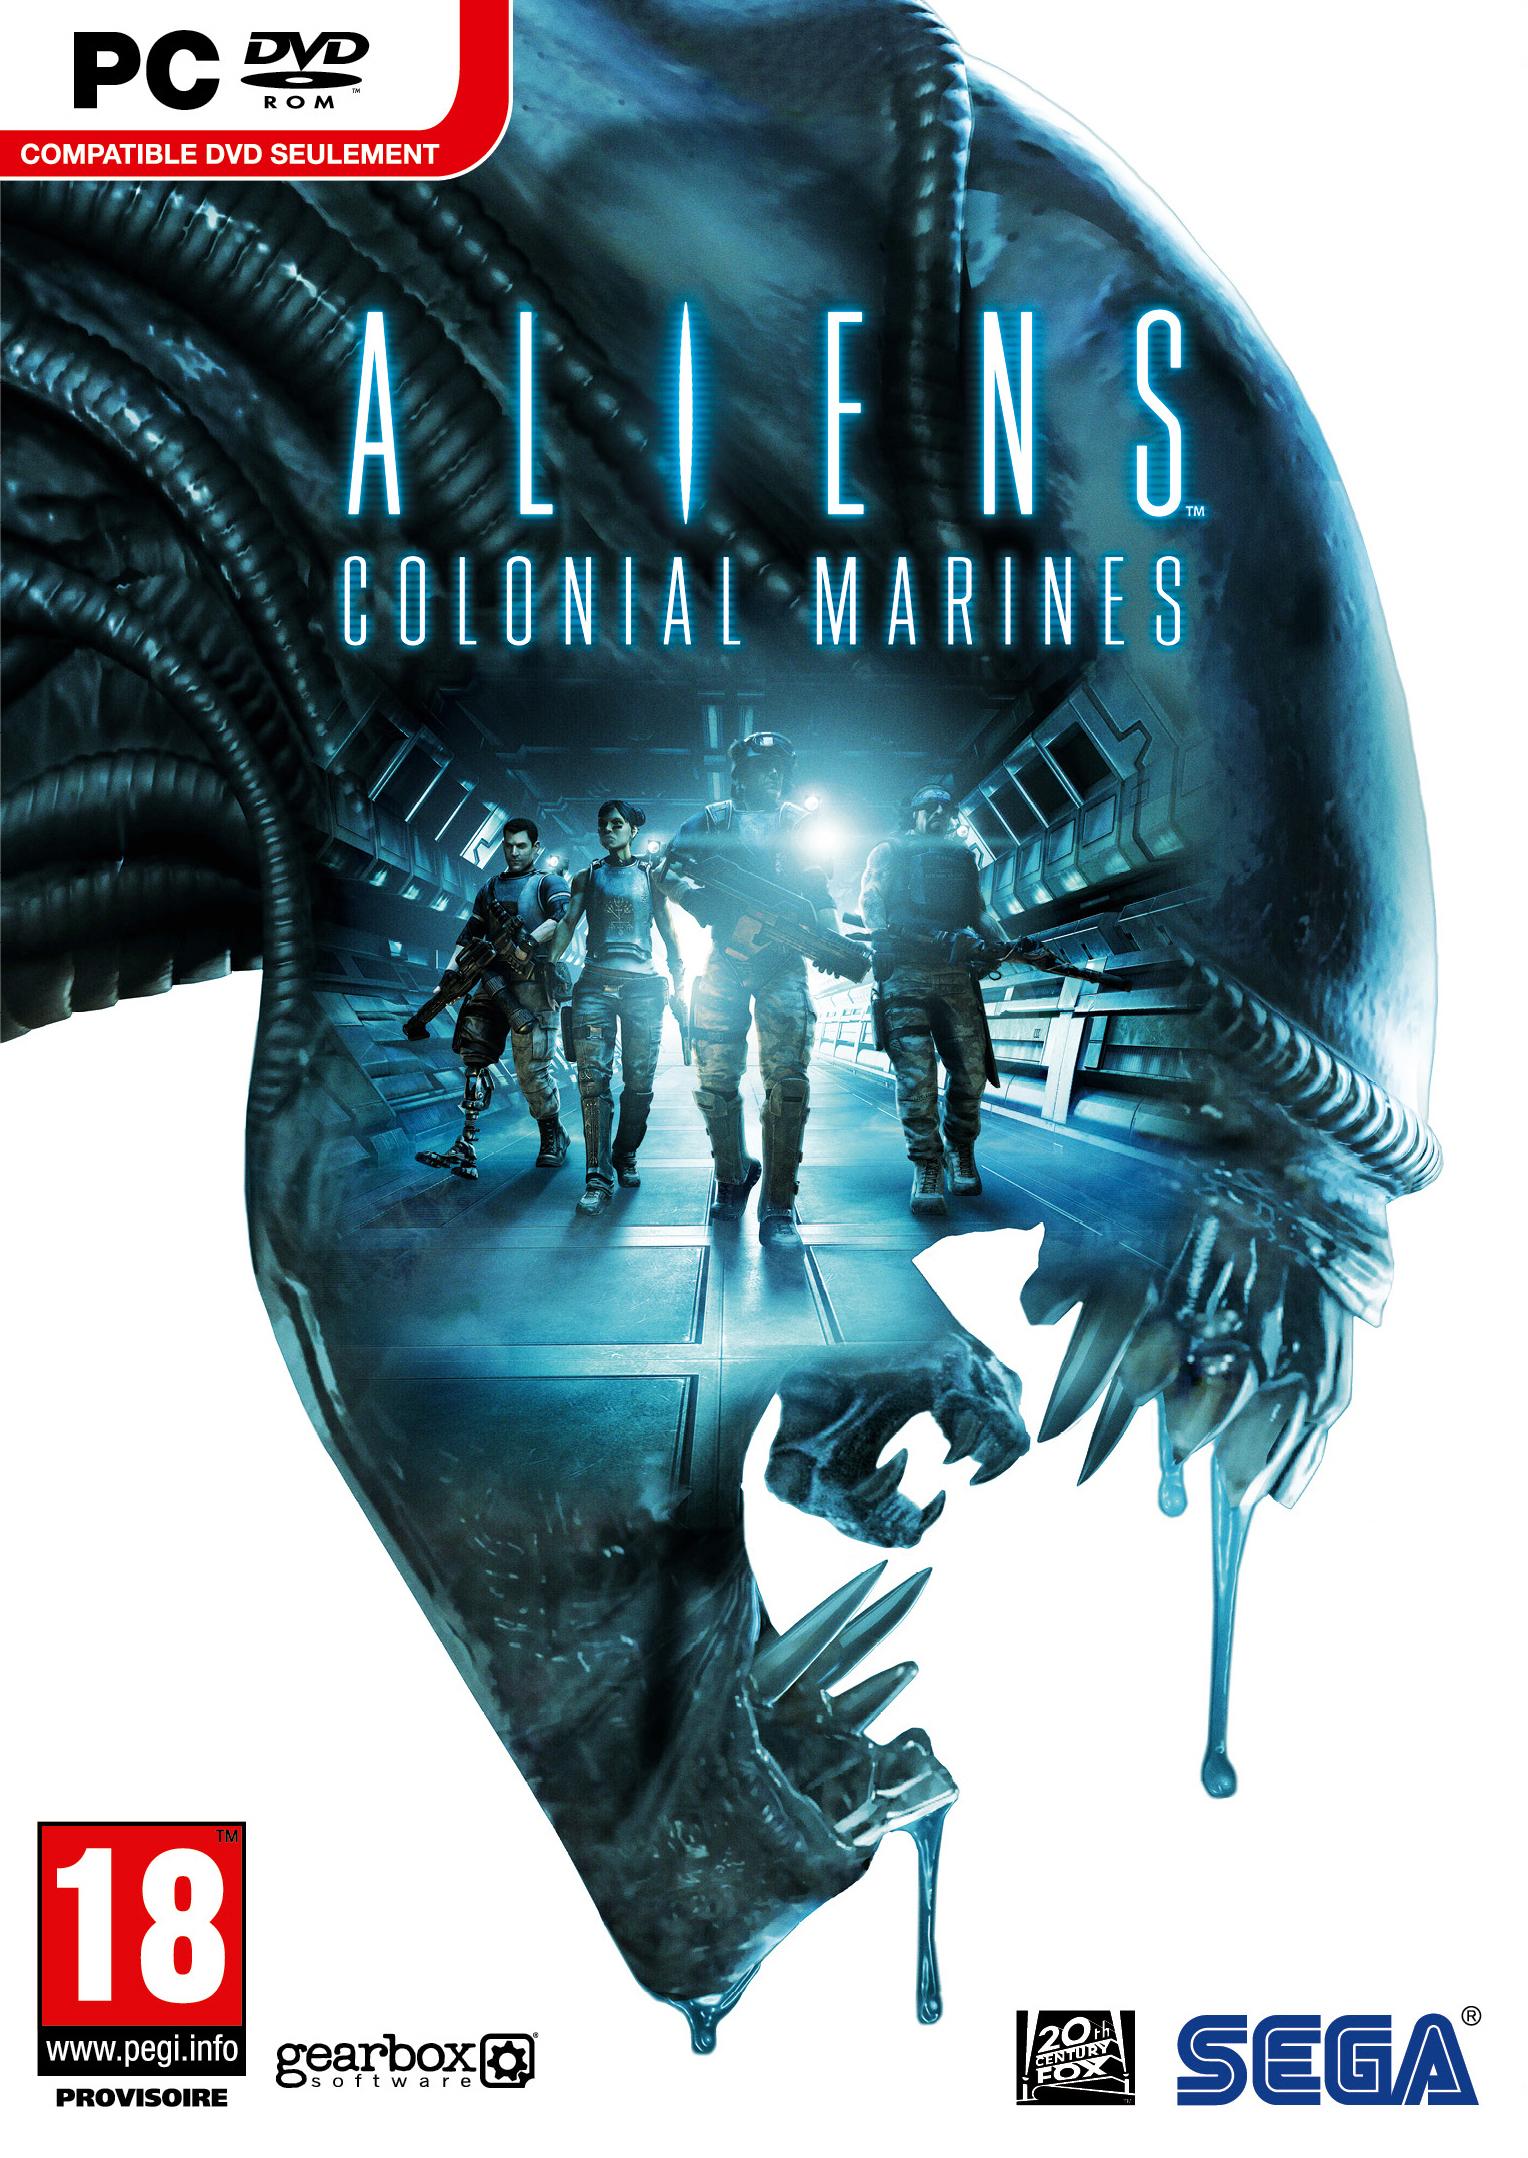 Aliens-ColonialMarines PC Jaquette 001